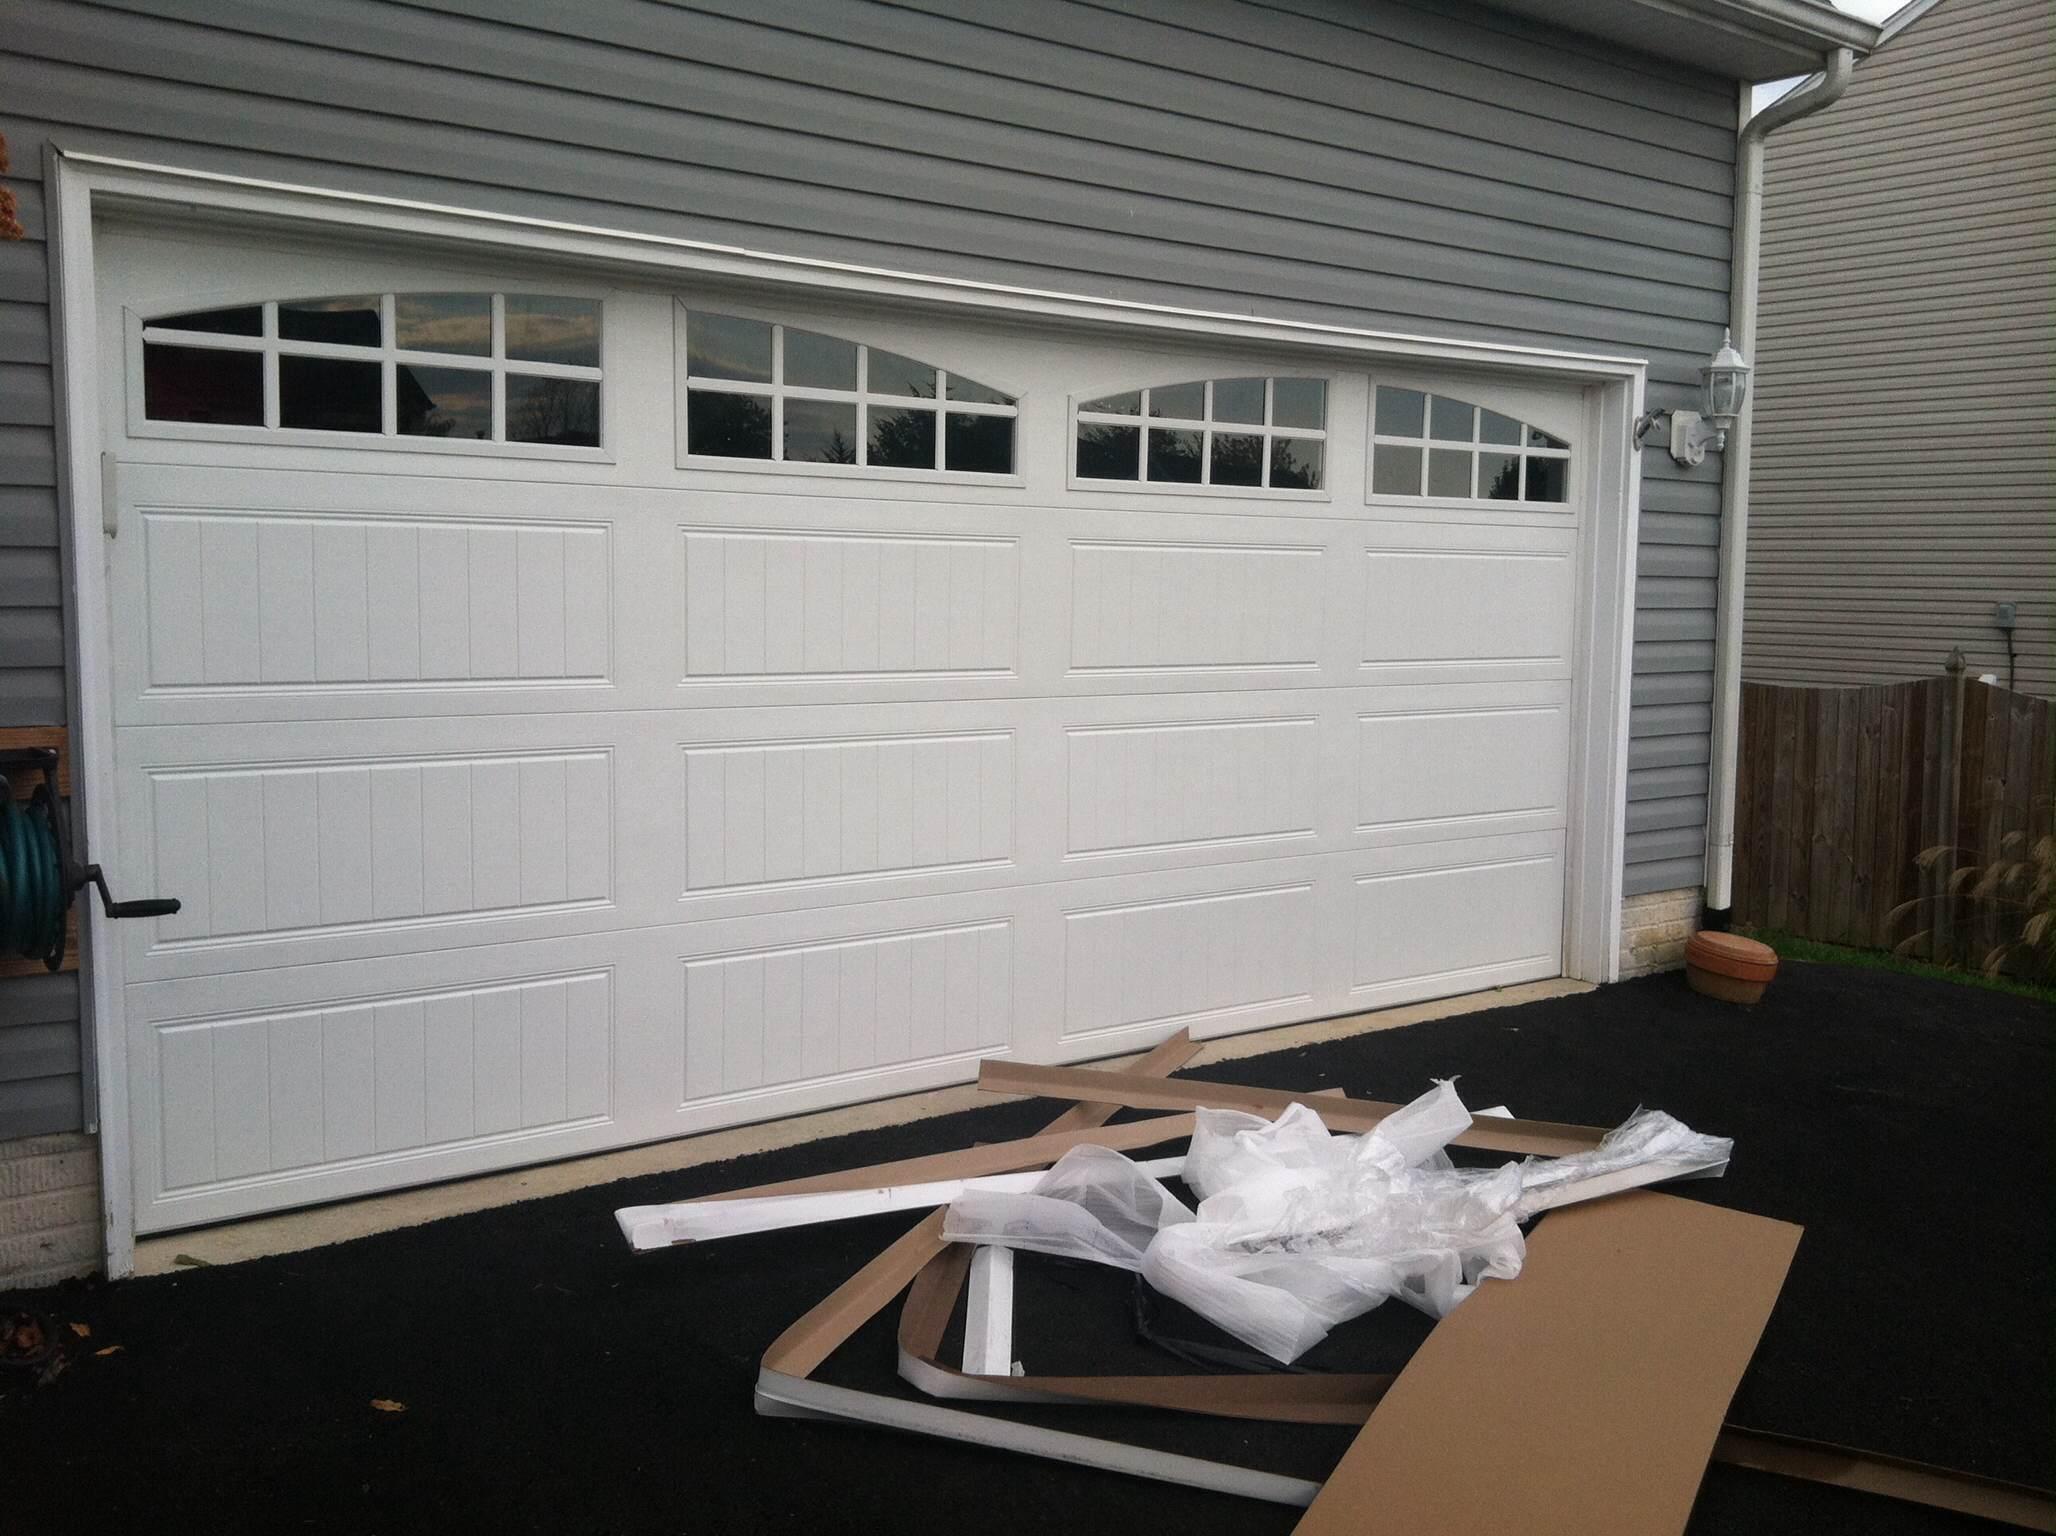 Lowes Pella Garage Door Review Dandk Organizer